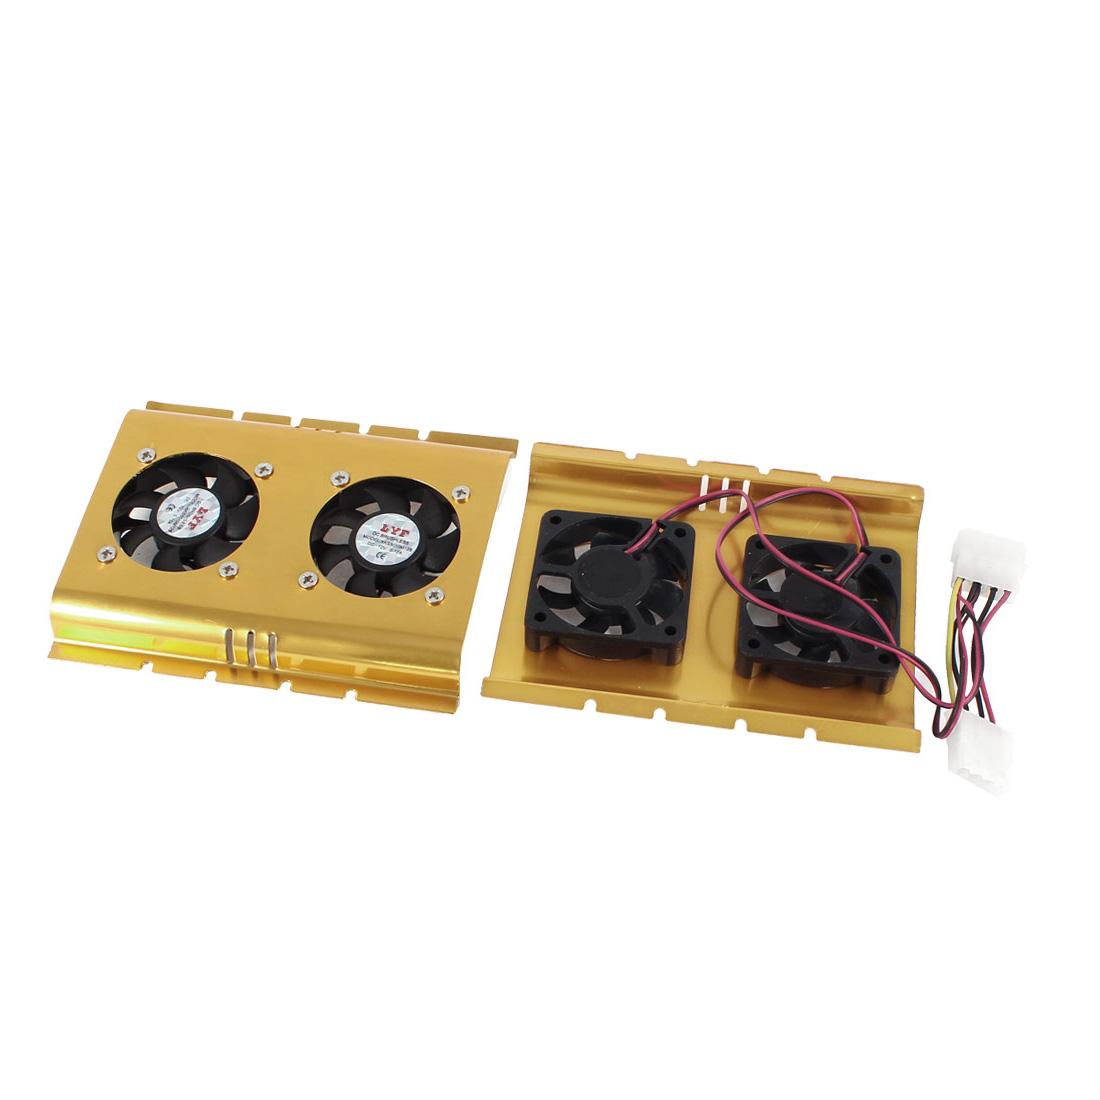 Hard Disk Drive 3.5 inch Dual Fan HDD Cooler 5000RPM 30dB Black Gold Tone 2 Pcs